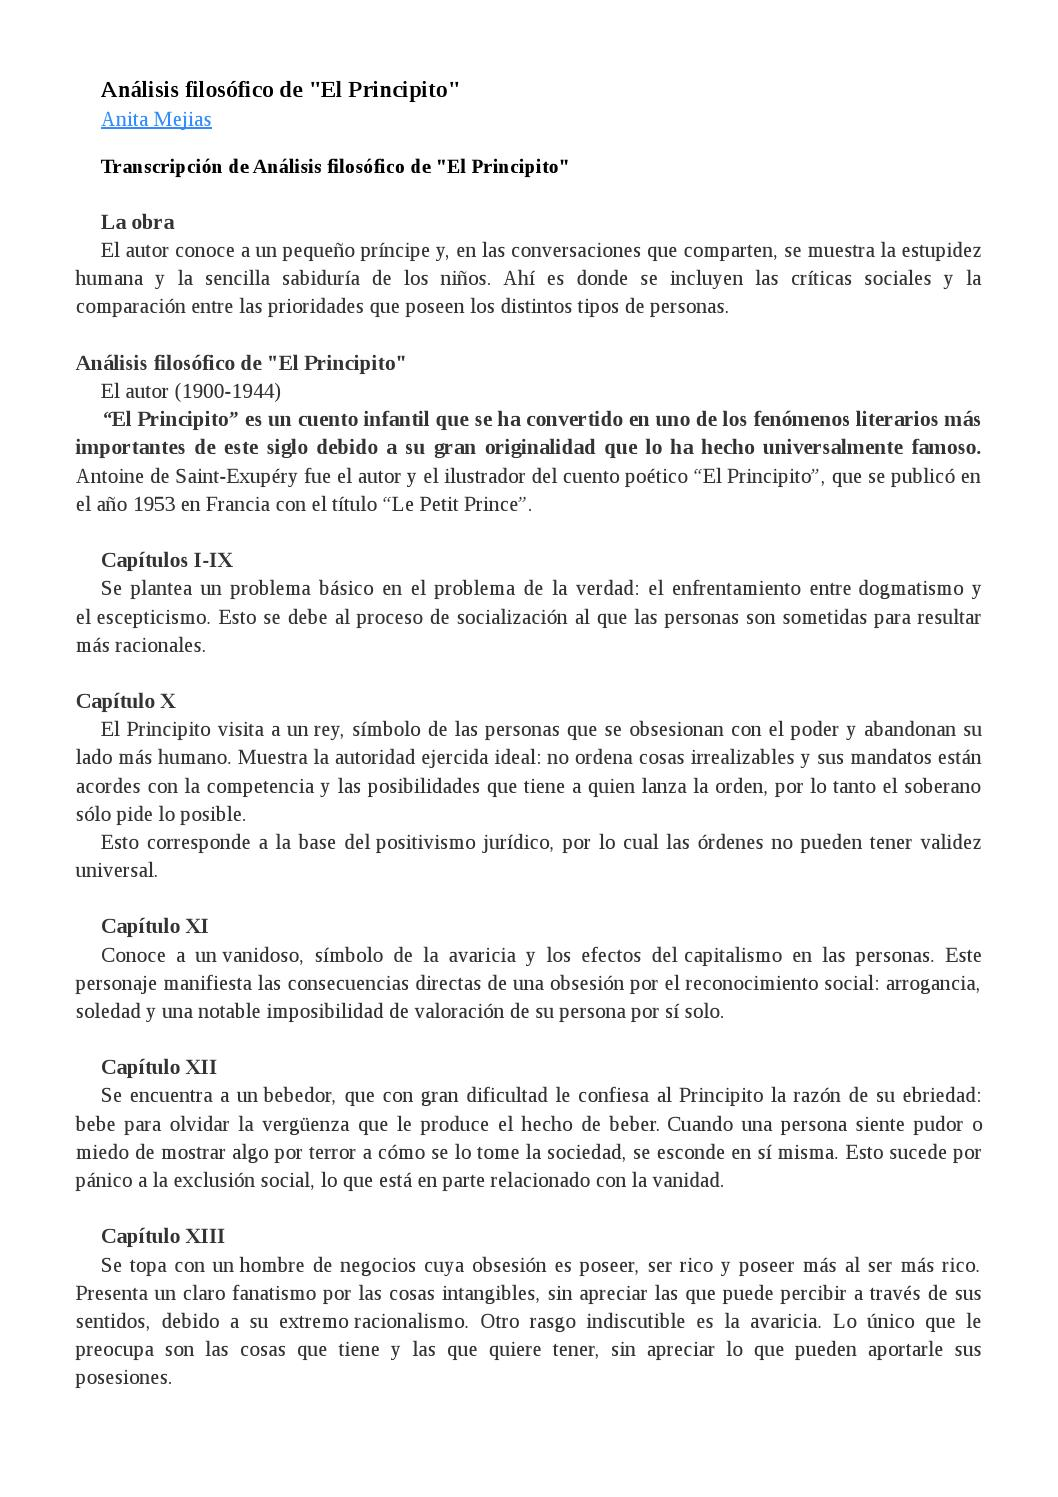 Análisis filosófico principito by Lulú Valencia - Issuu